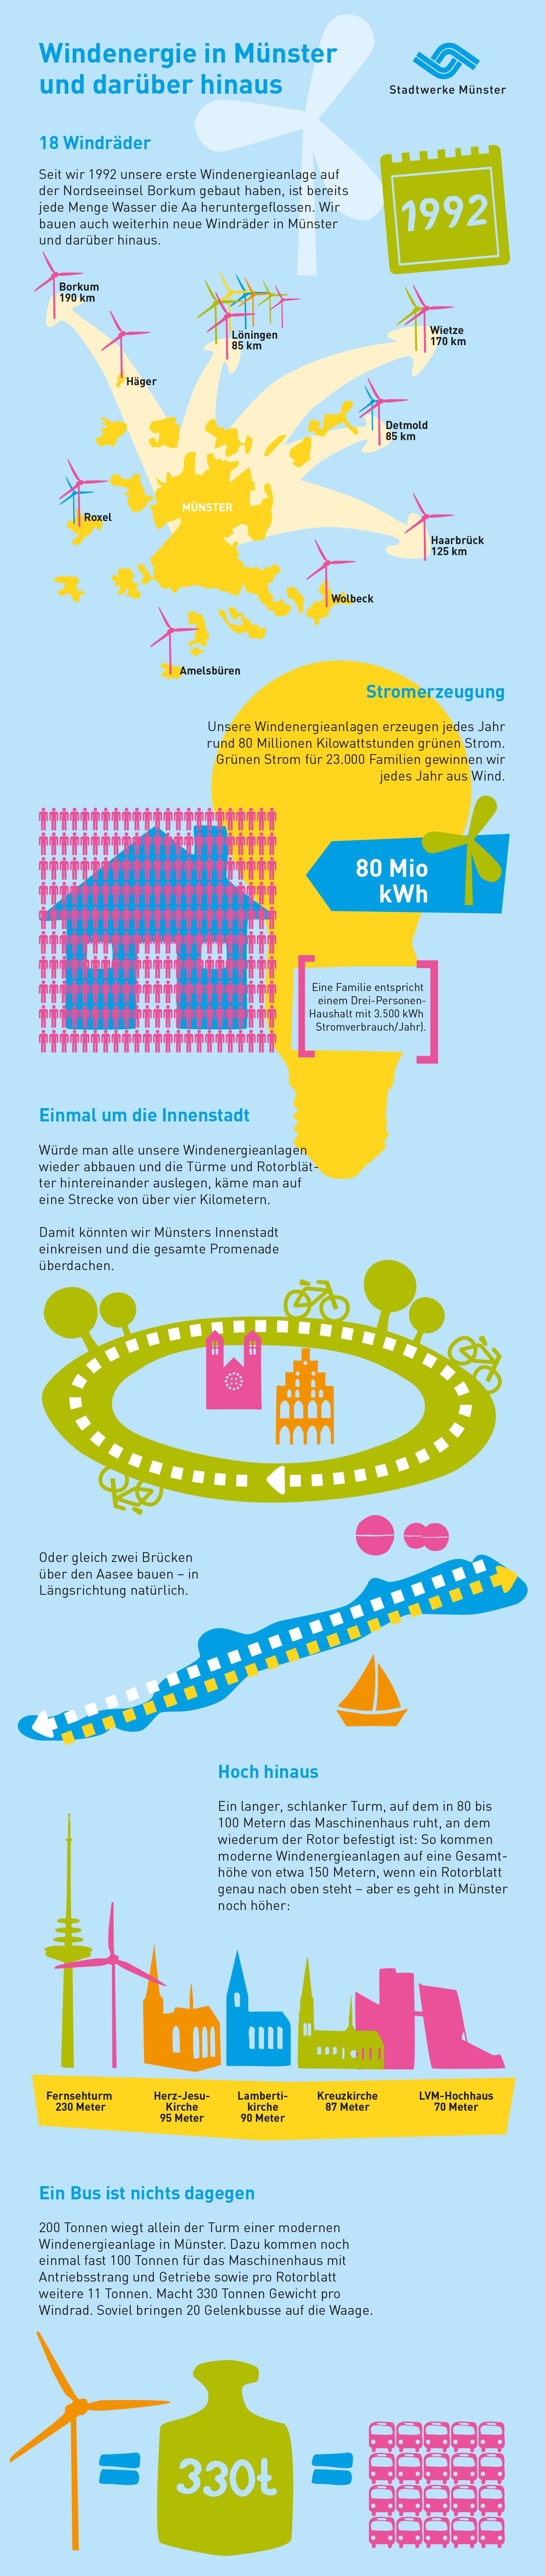 Infografik Windenergie